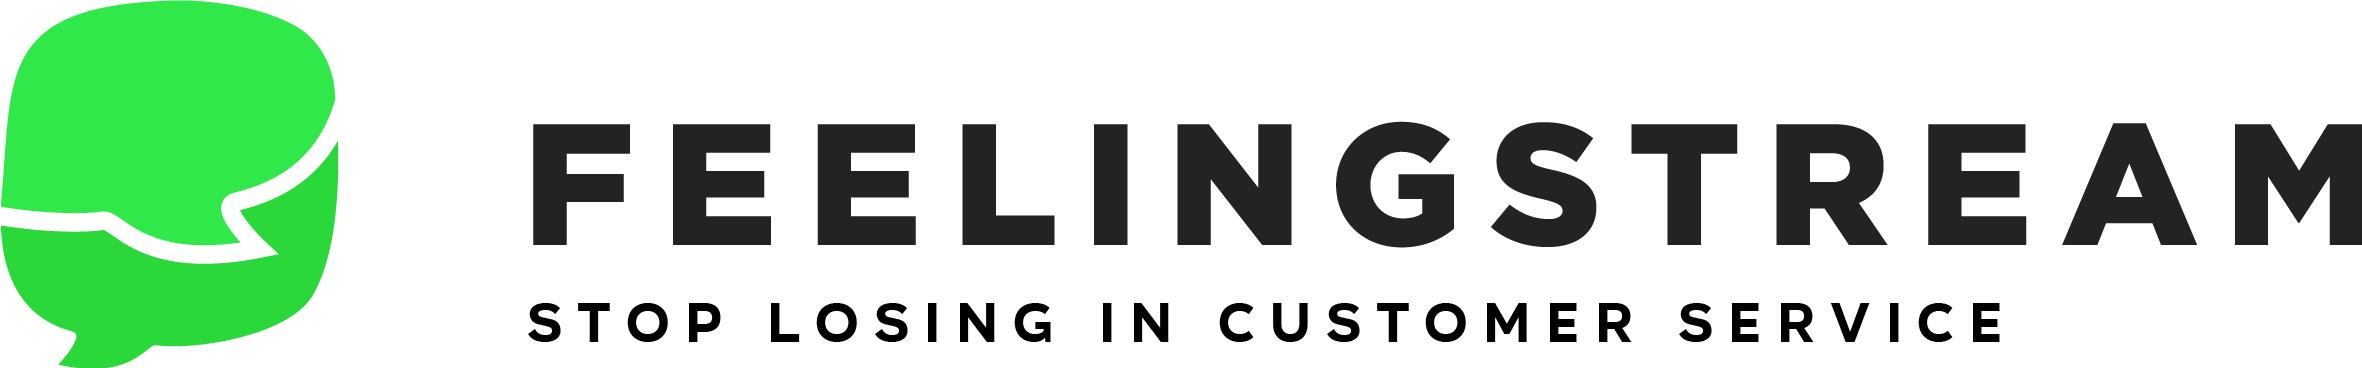 Feelingstream - stop losing in customer service - logo